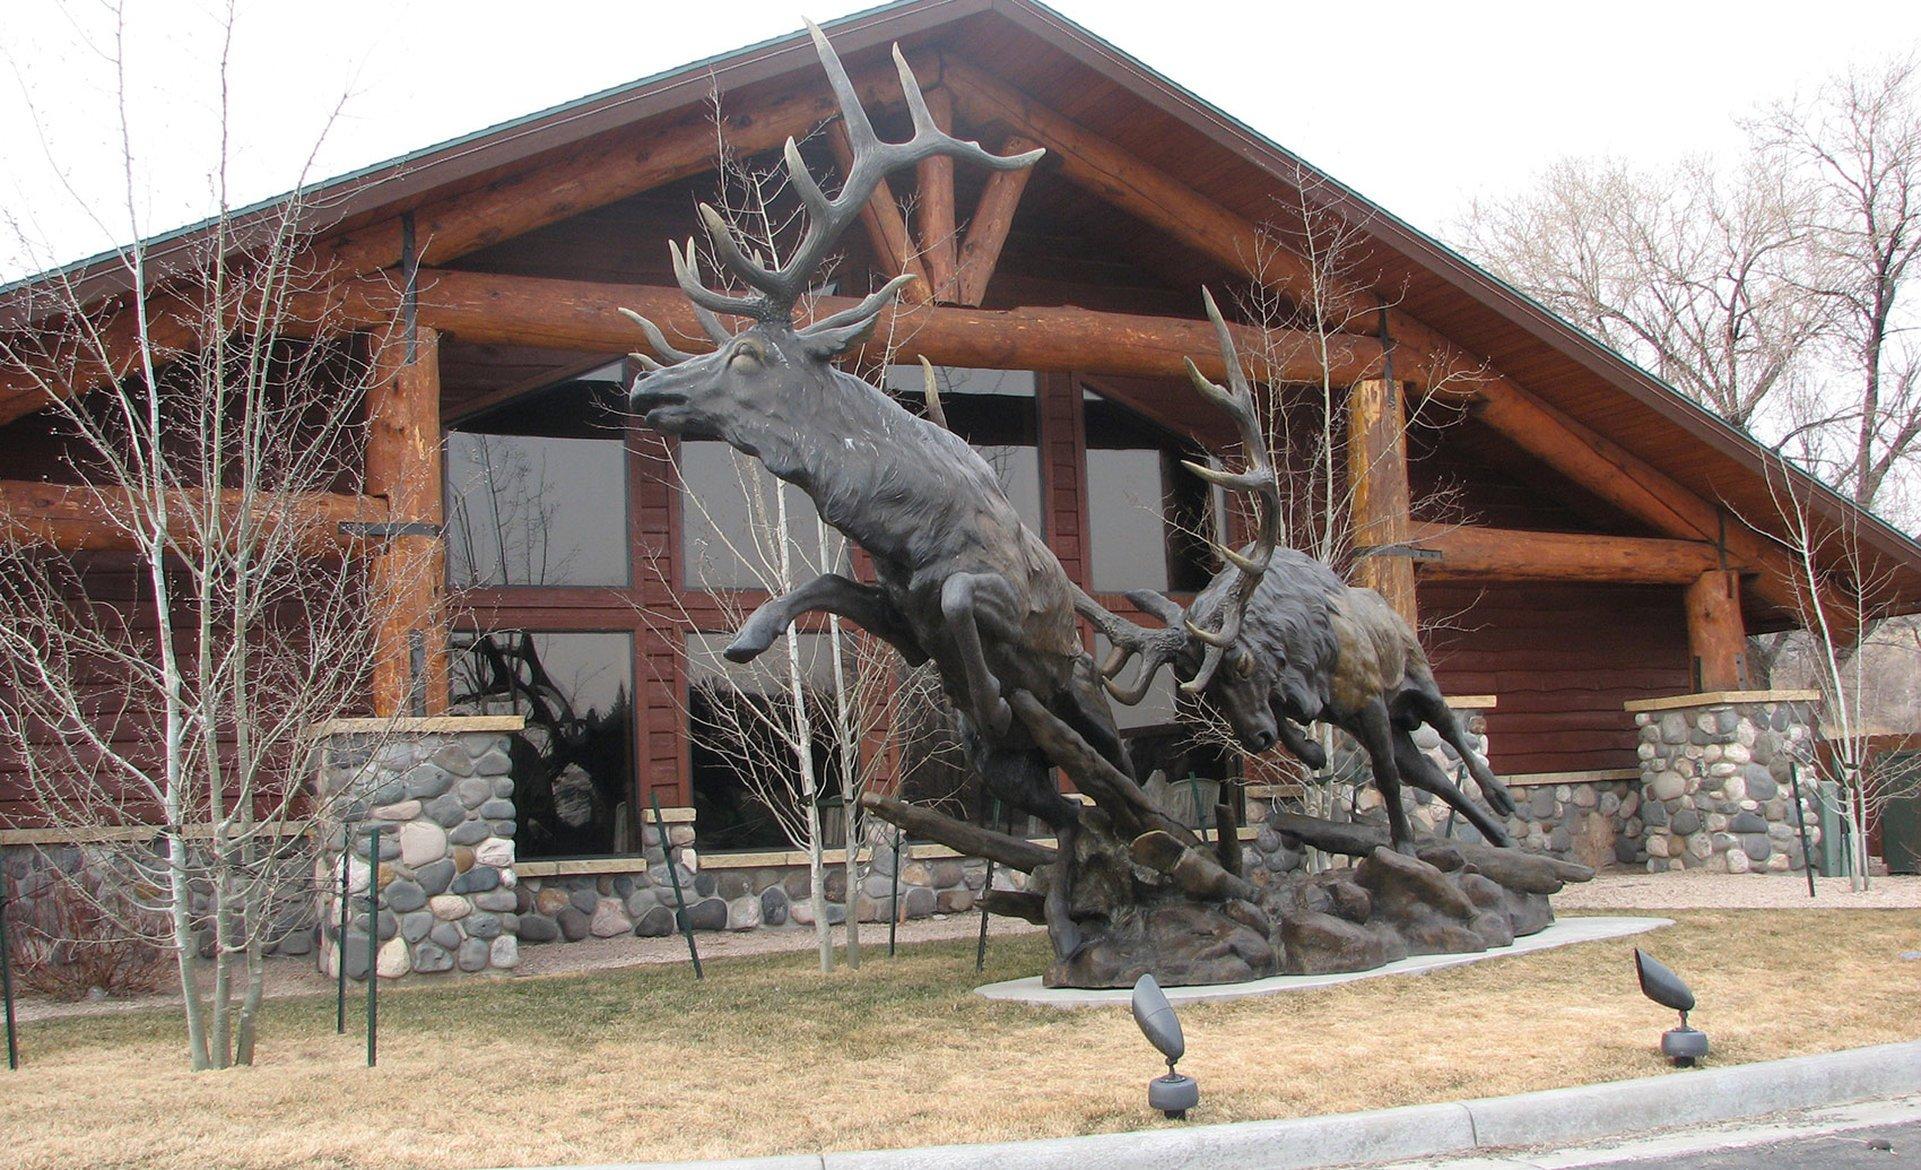 AmericInn Lodge & Suites Cody - Yellowstone